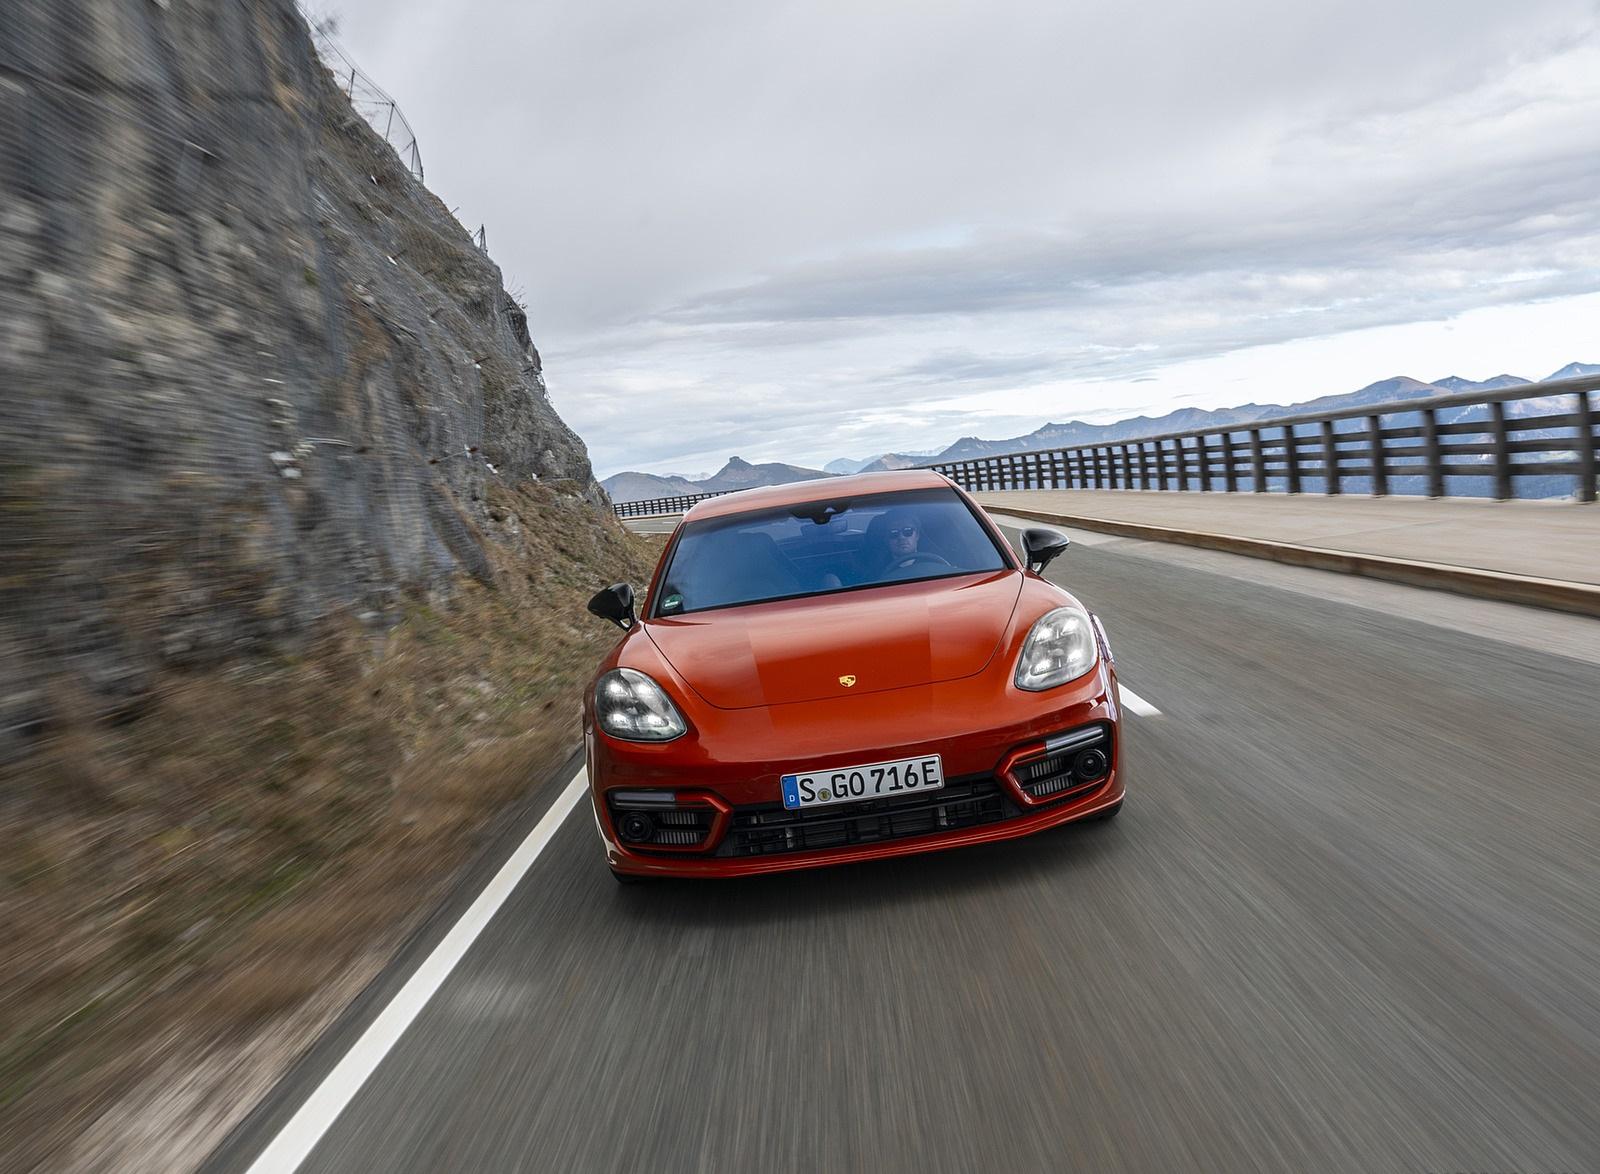 2021 Porsche Panamera 4 E-Hybrid Sport Turismo (Color: Papaya Metallic) Front Wallpapers (2)